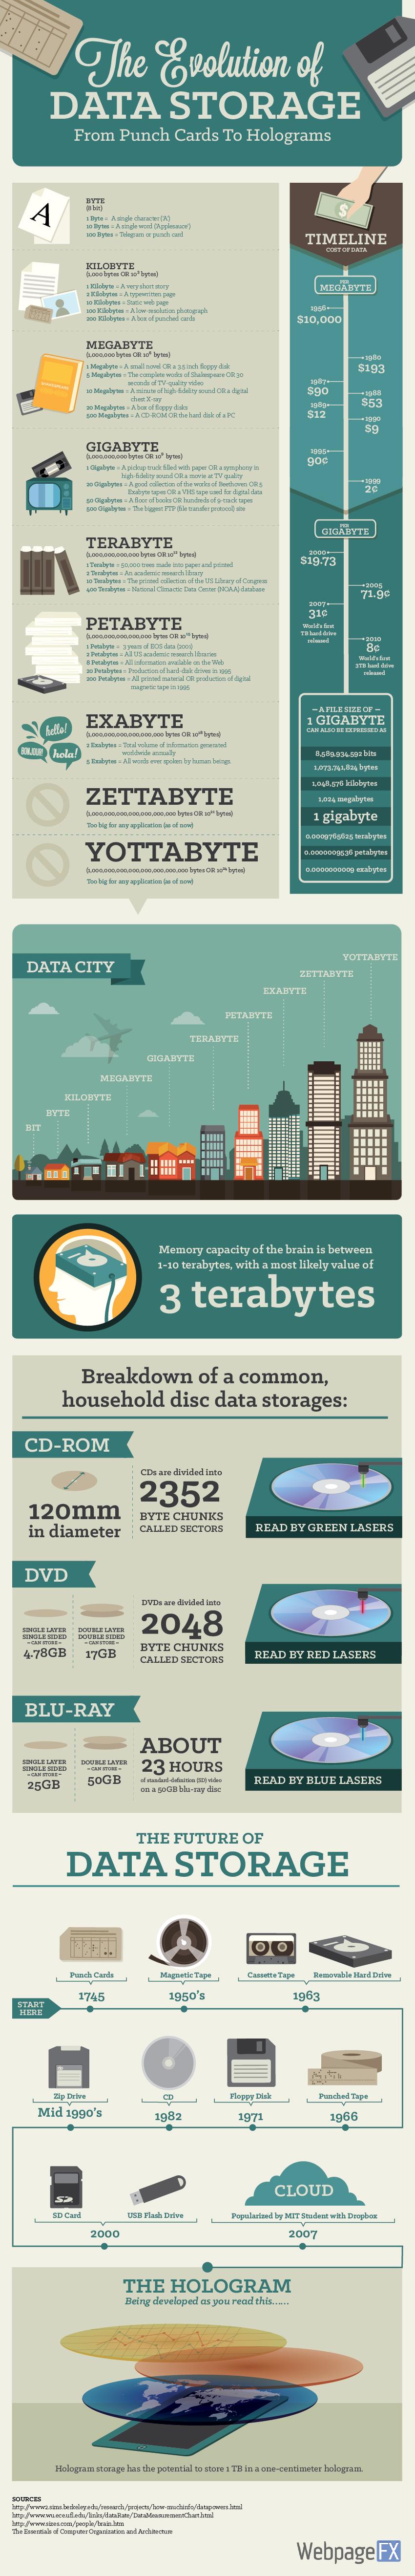 1data-storage-infographic